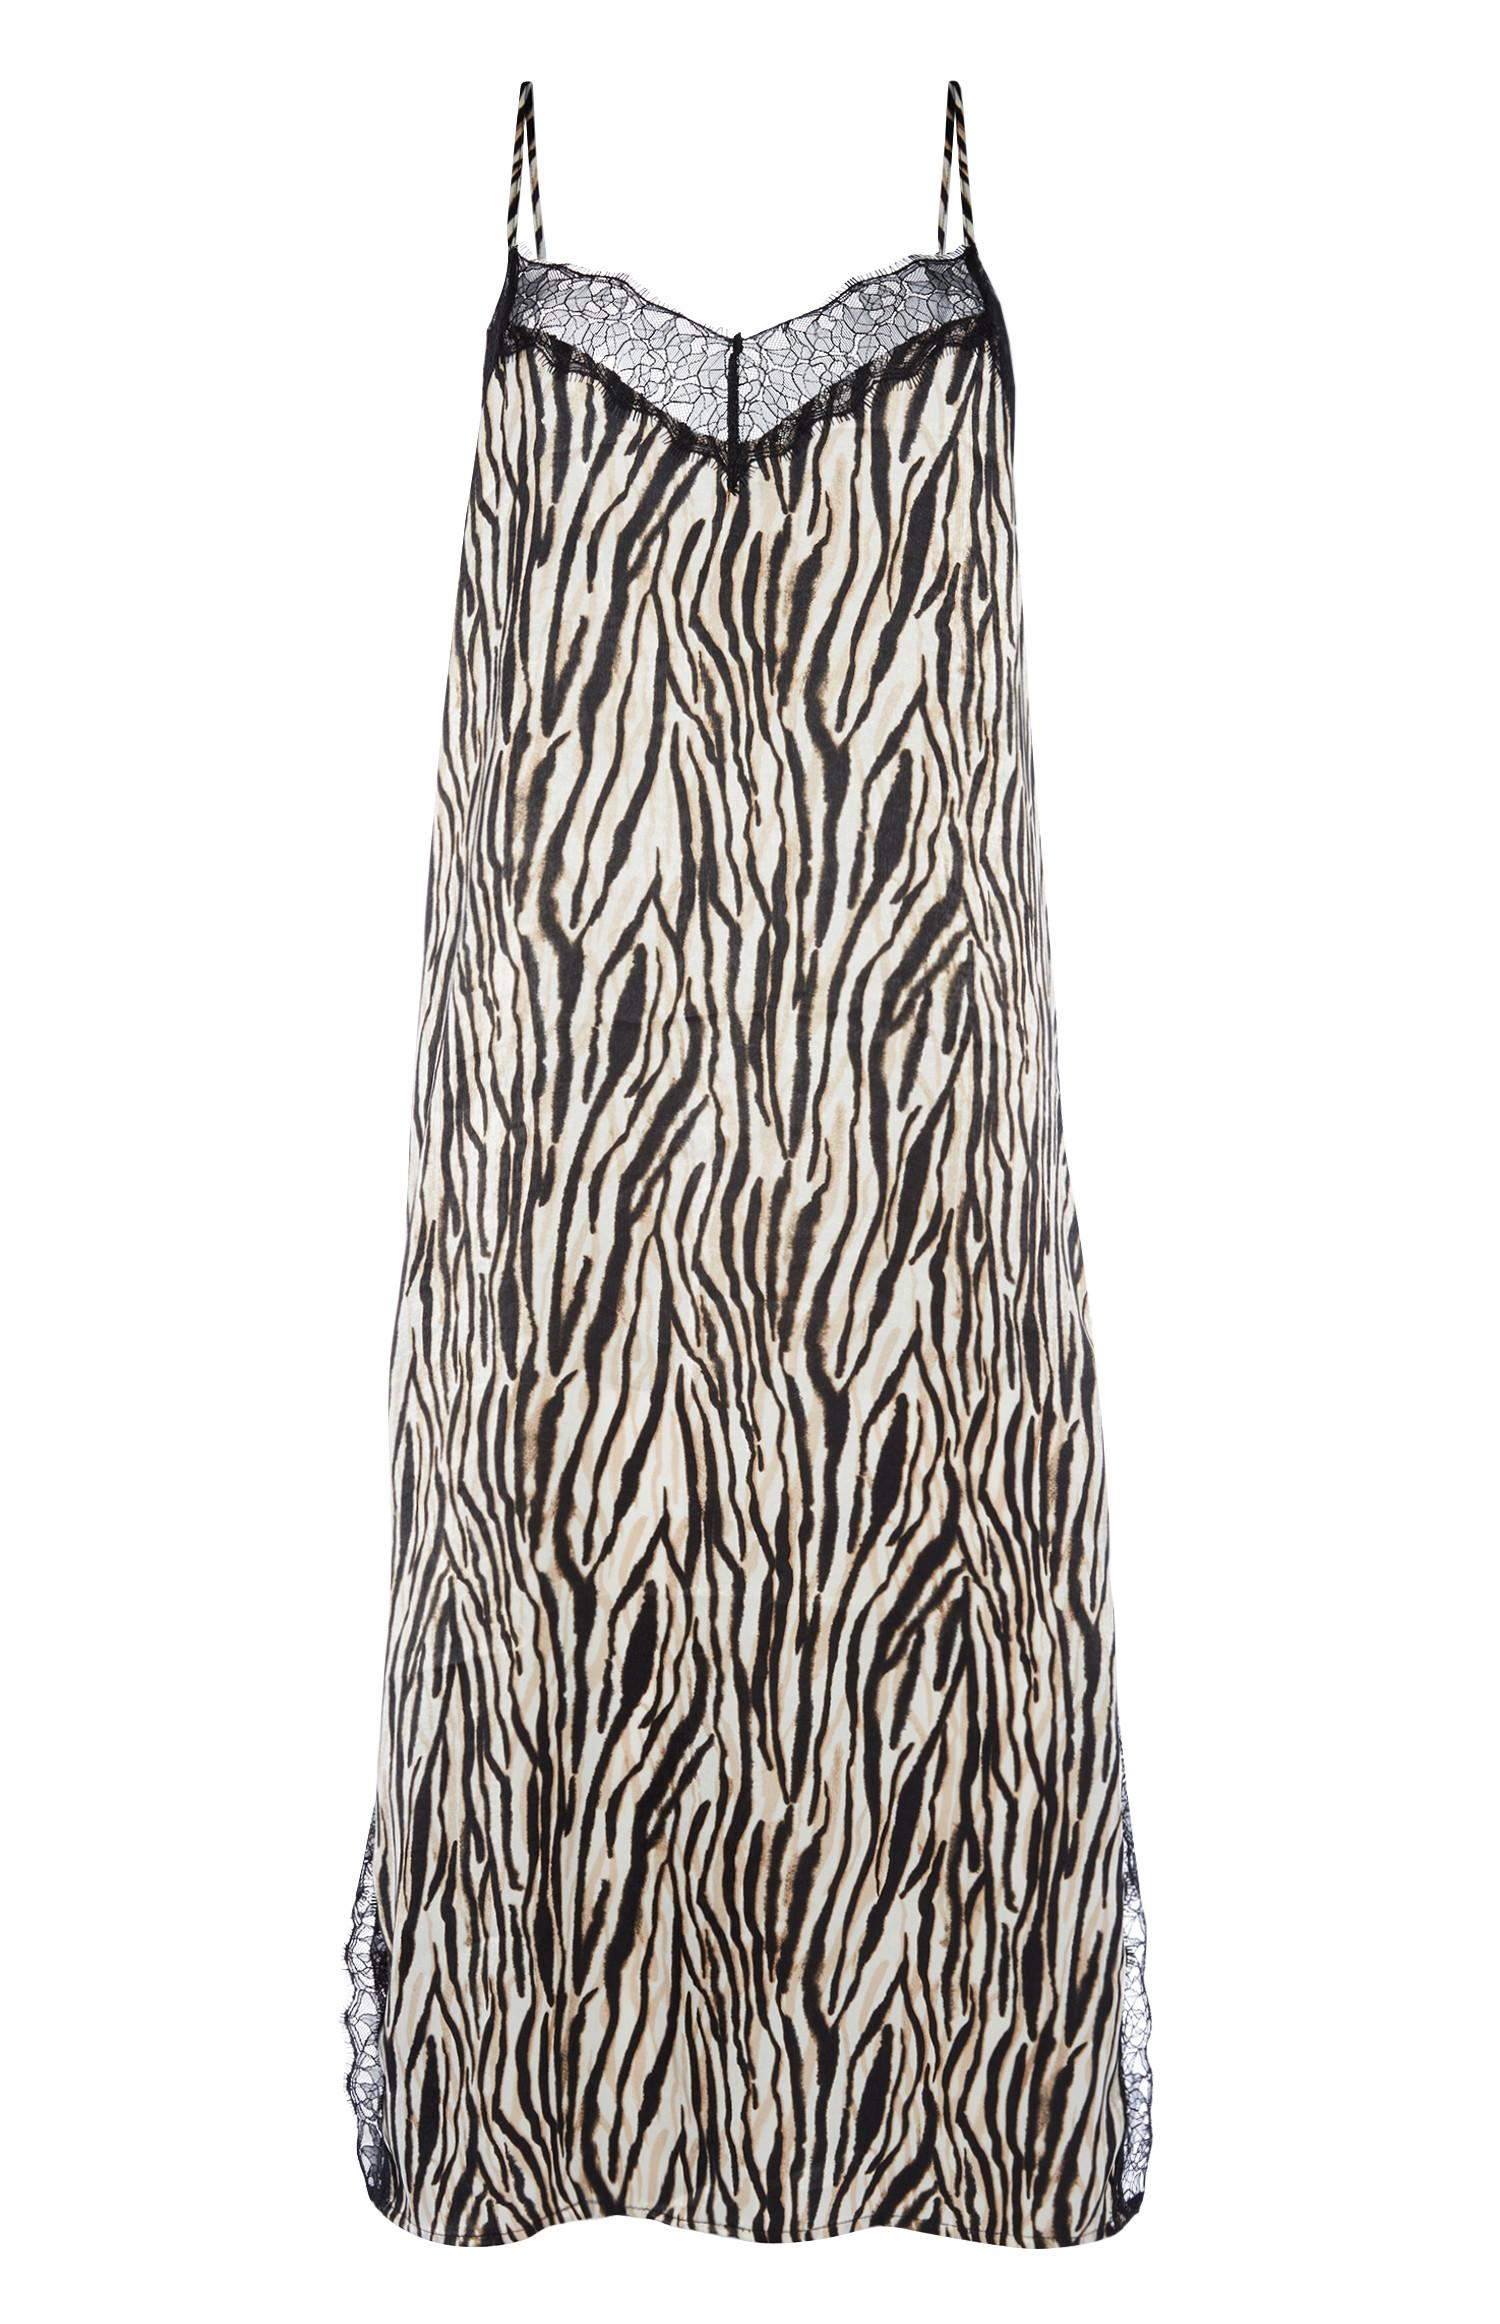 Camisa noite cetim padrão zebra